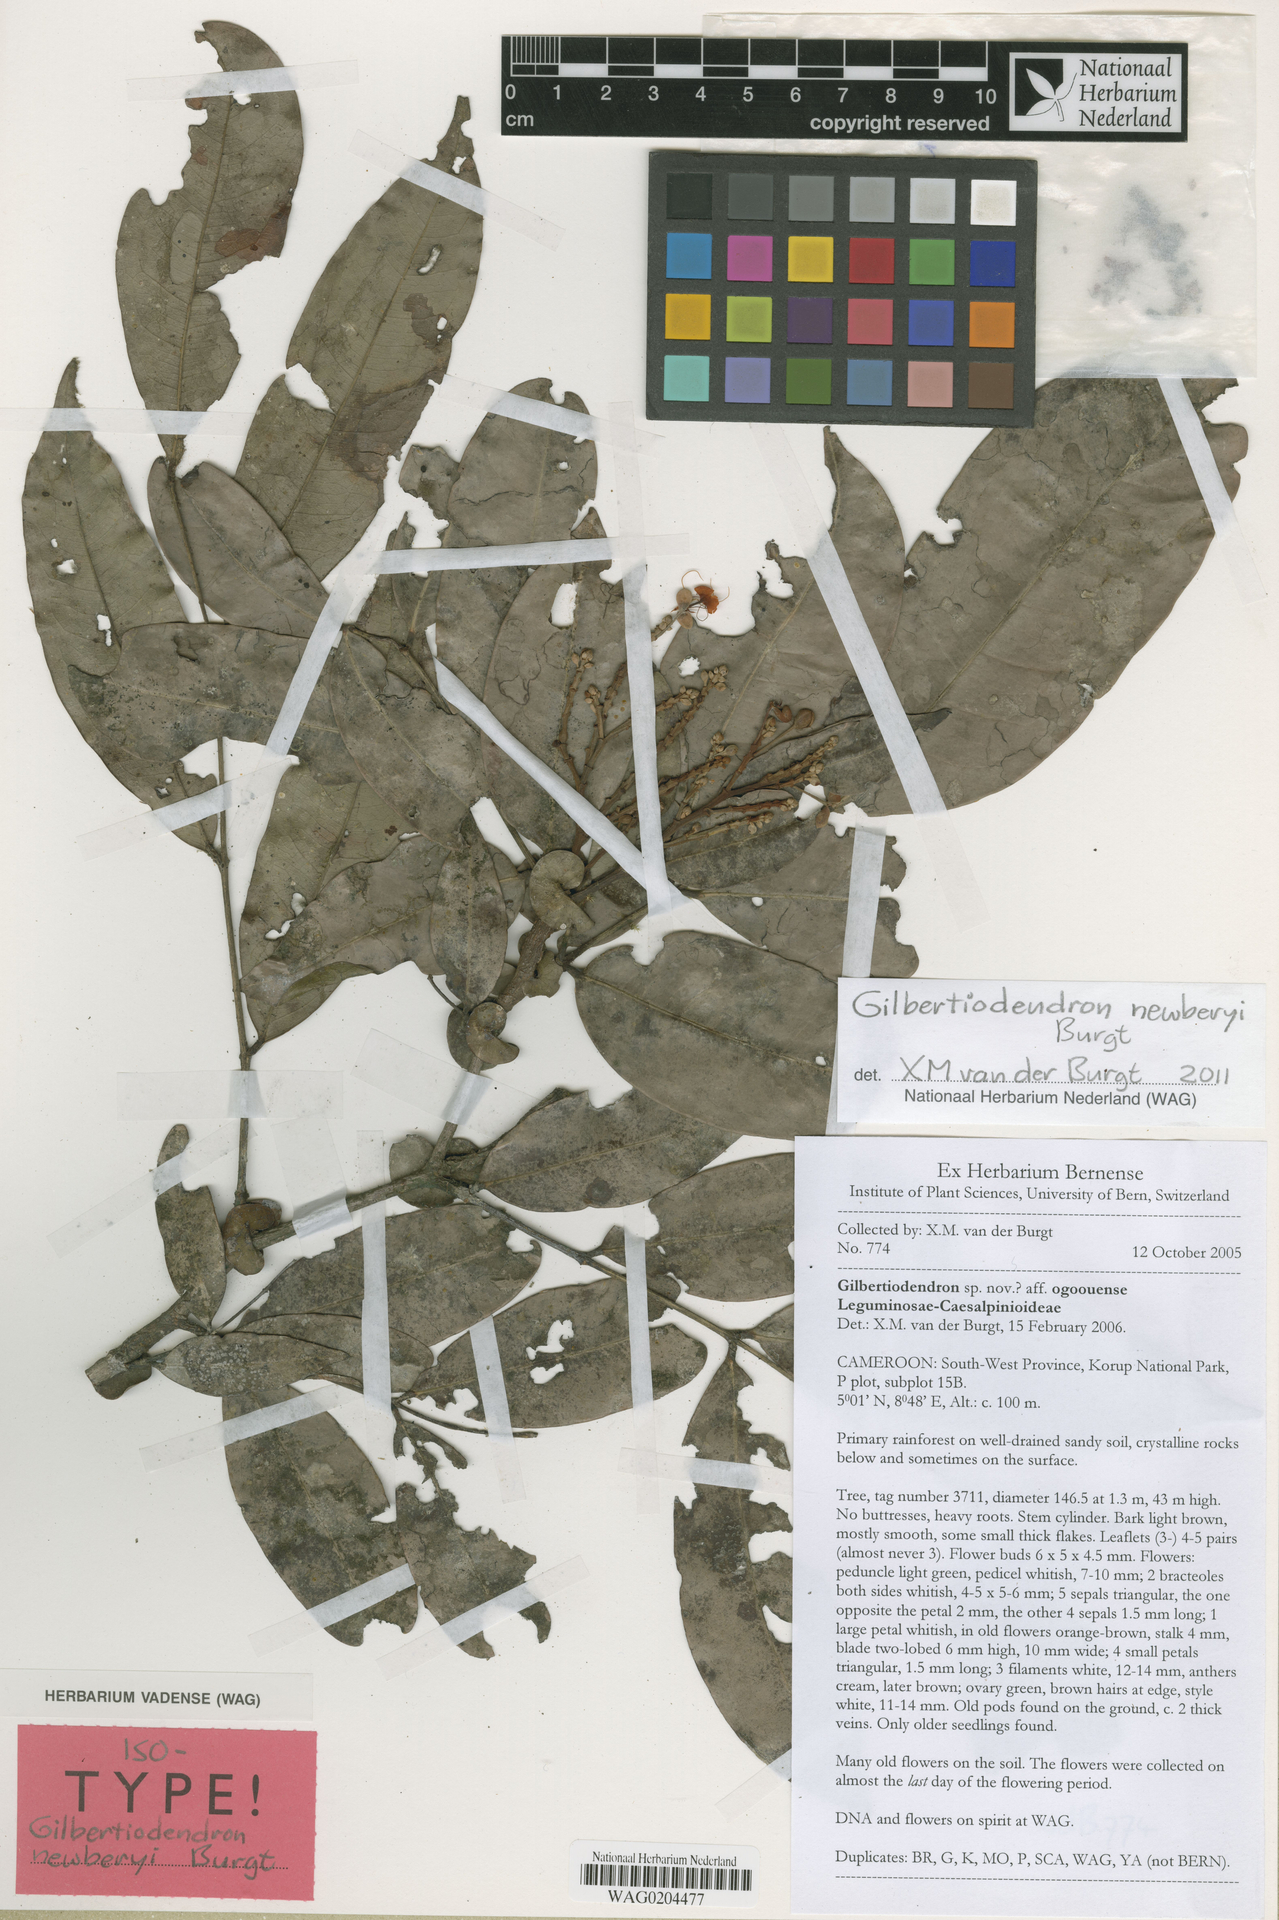 WAG0204477   Gilbertiodendron newberyi Burgt